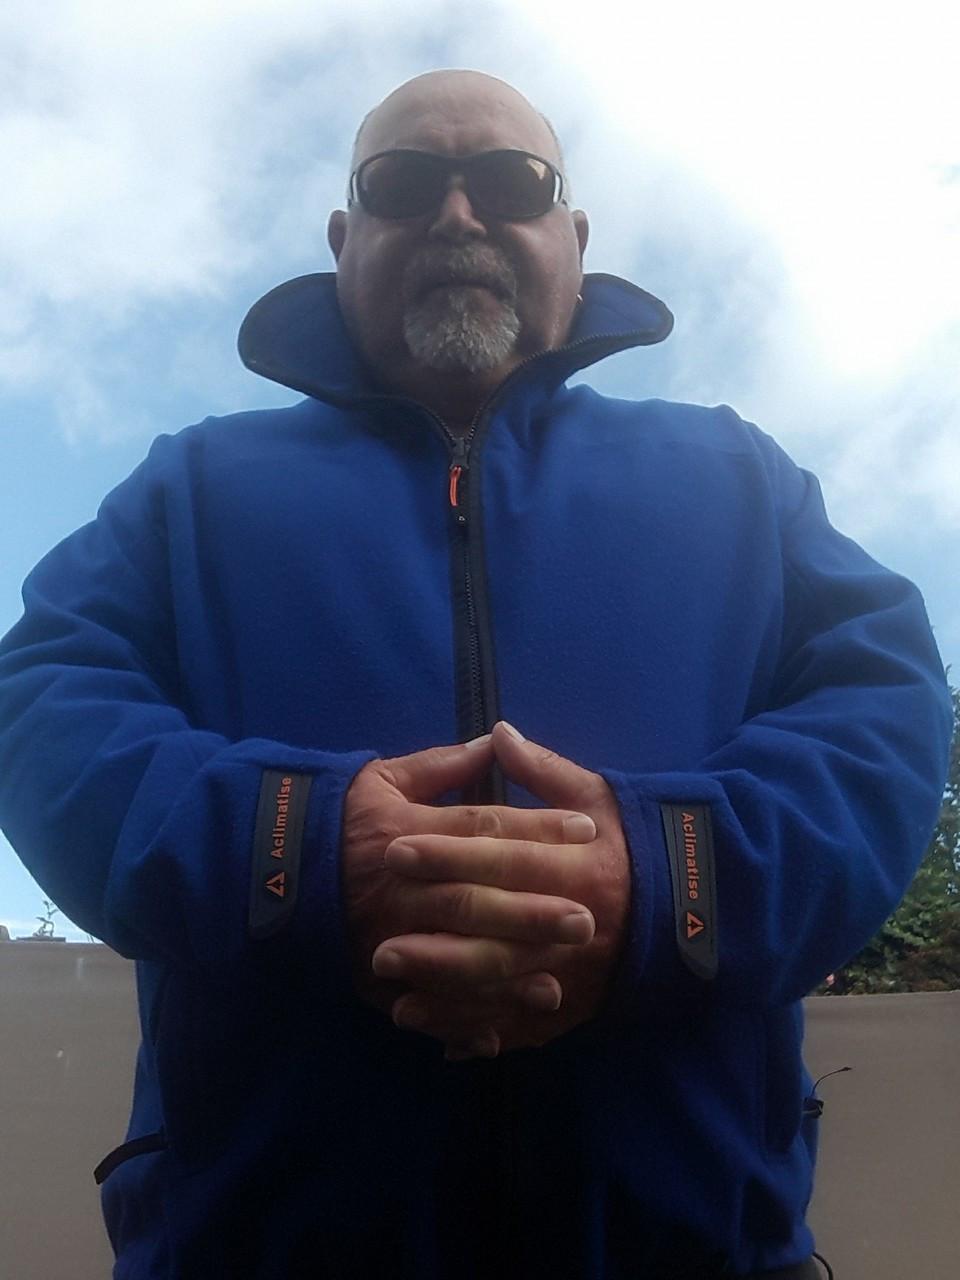 Tony King Angling ambassador, wearing the Highlander Fleece in Royal